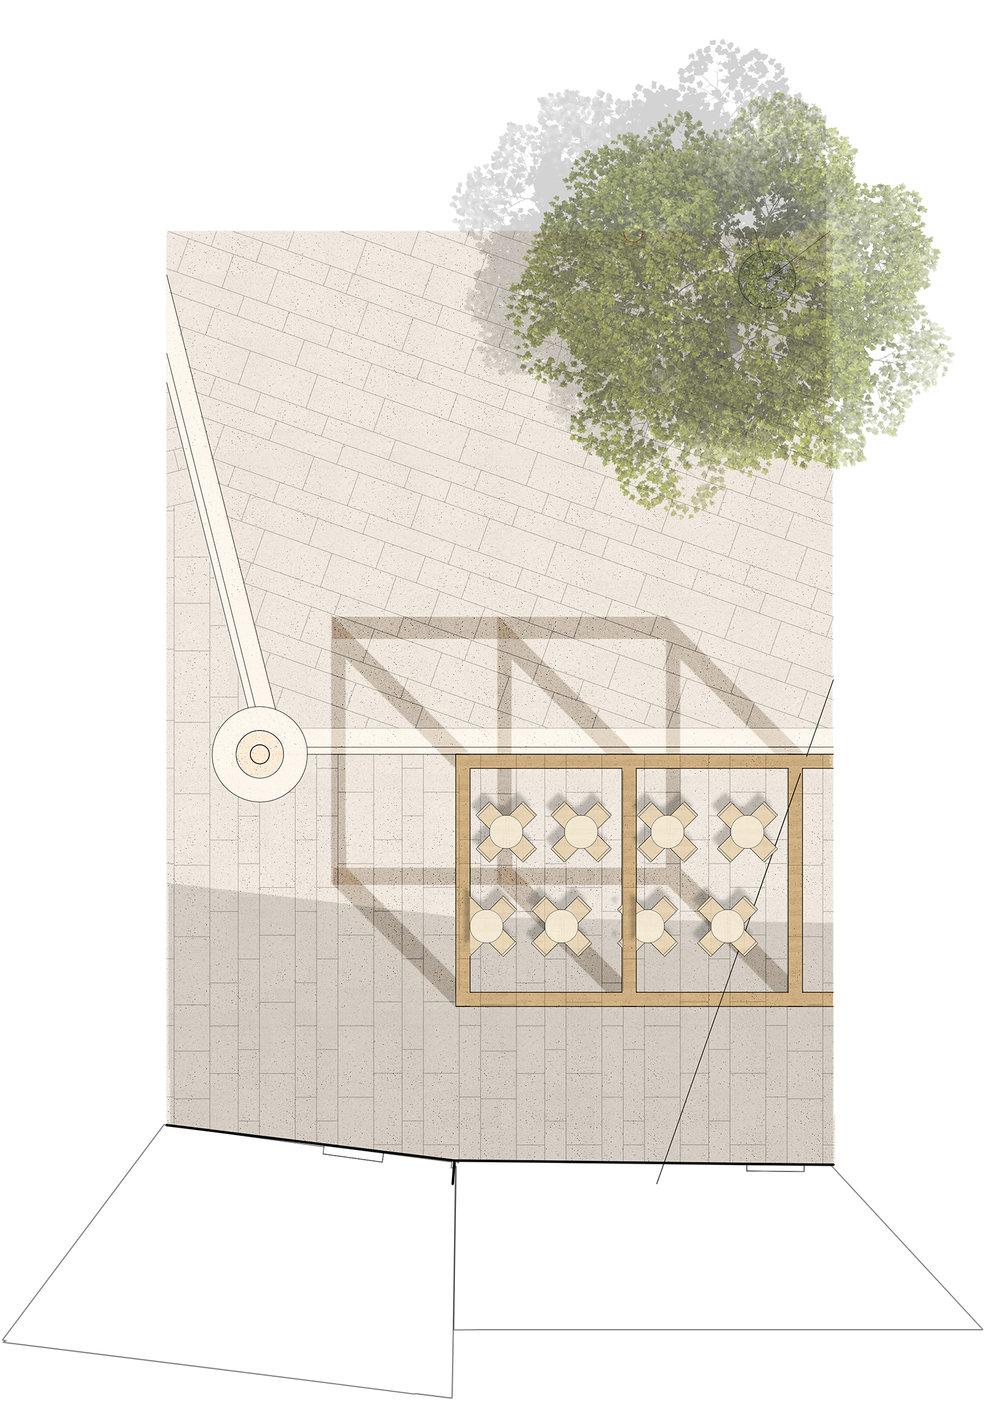 Architecture_Kombinat-Tina Rugelj_plan-under the pergola_Brolo square.jpg